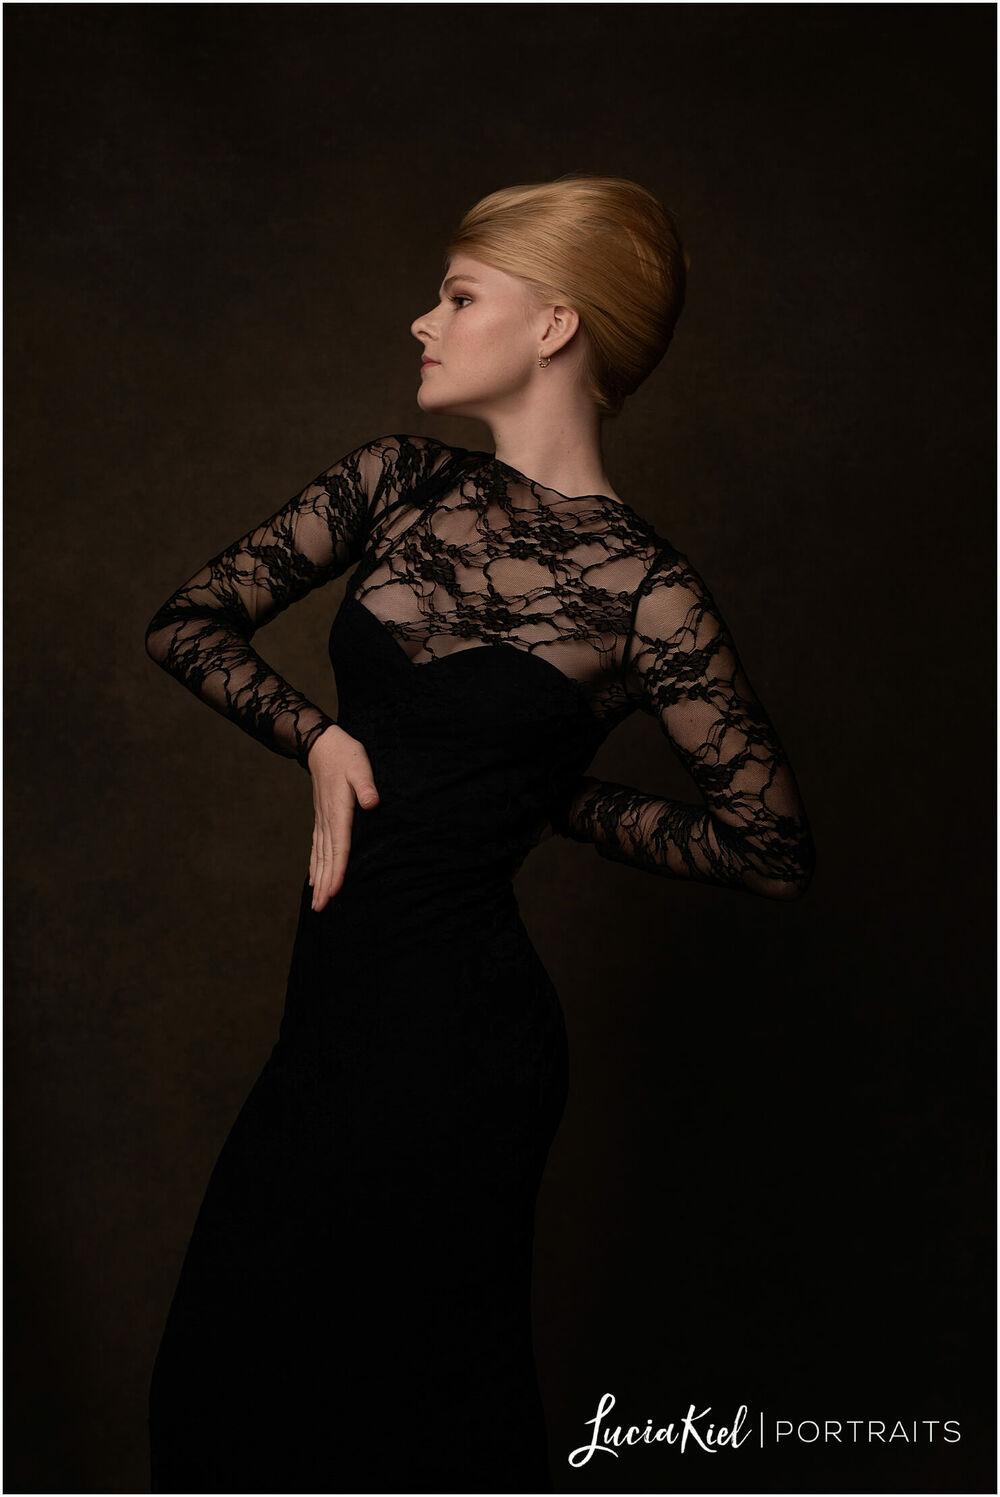 luciakielportraits campbell vanity fair portrait 0003